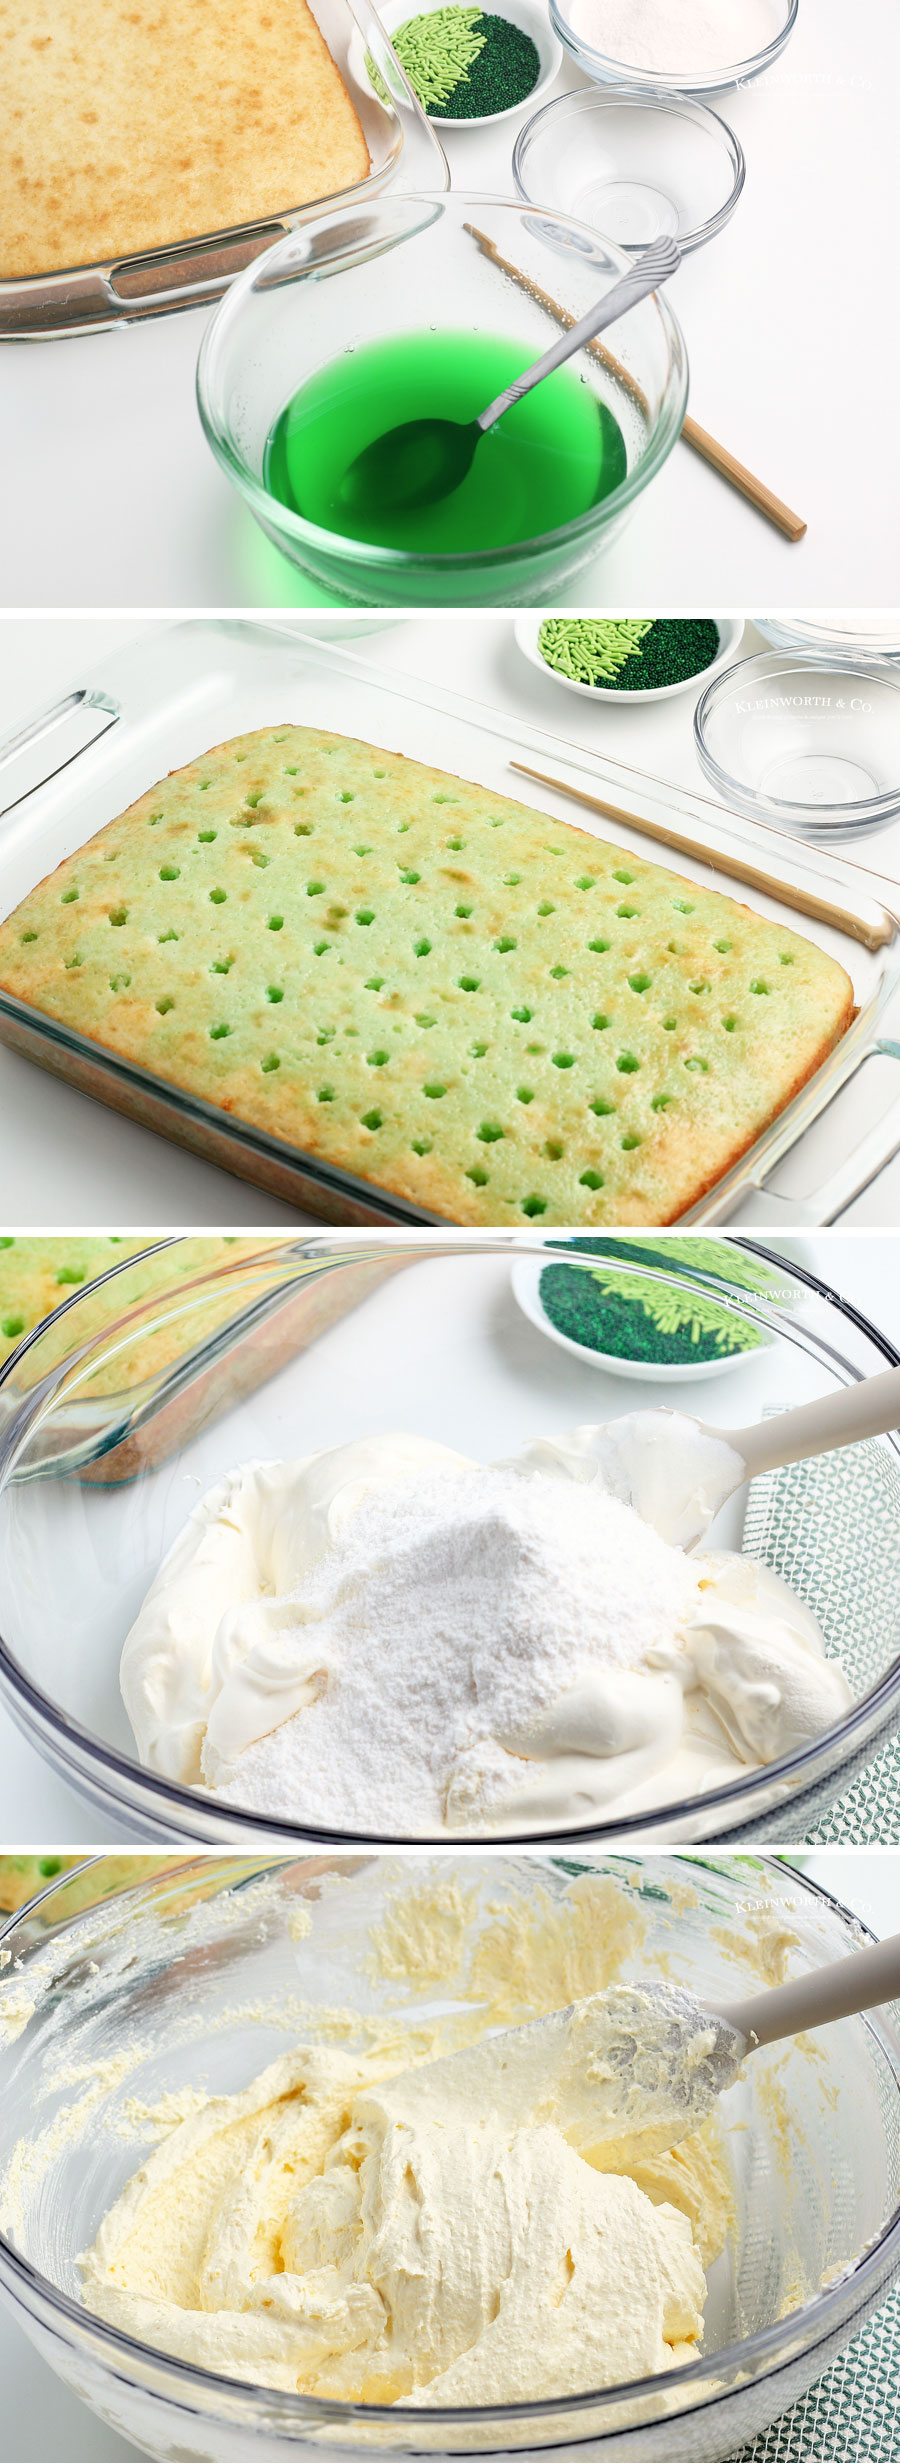 How to make Jello Poke Cake part 2